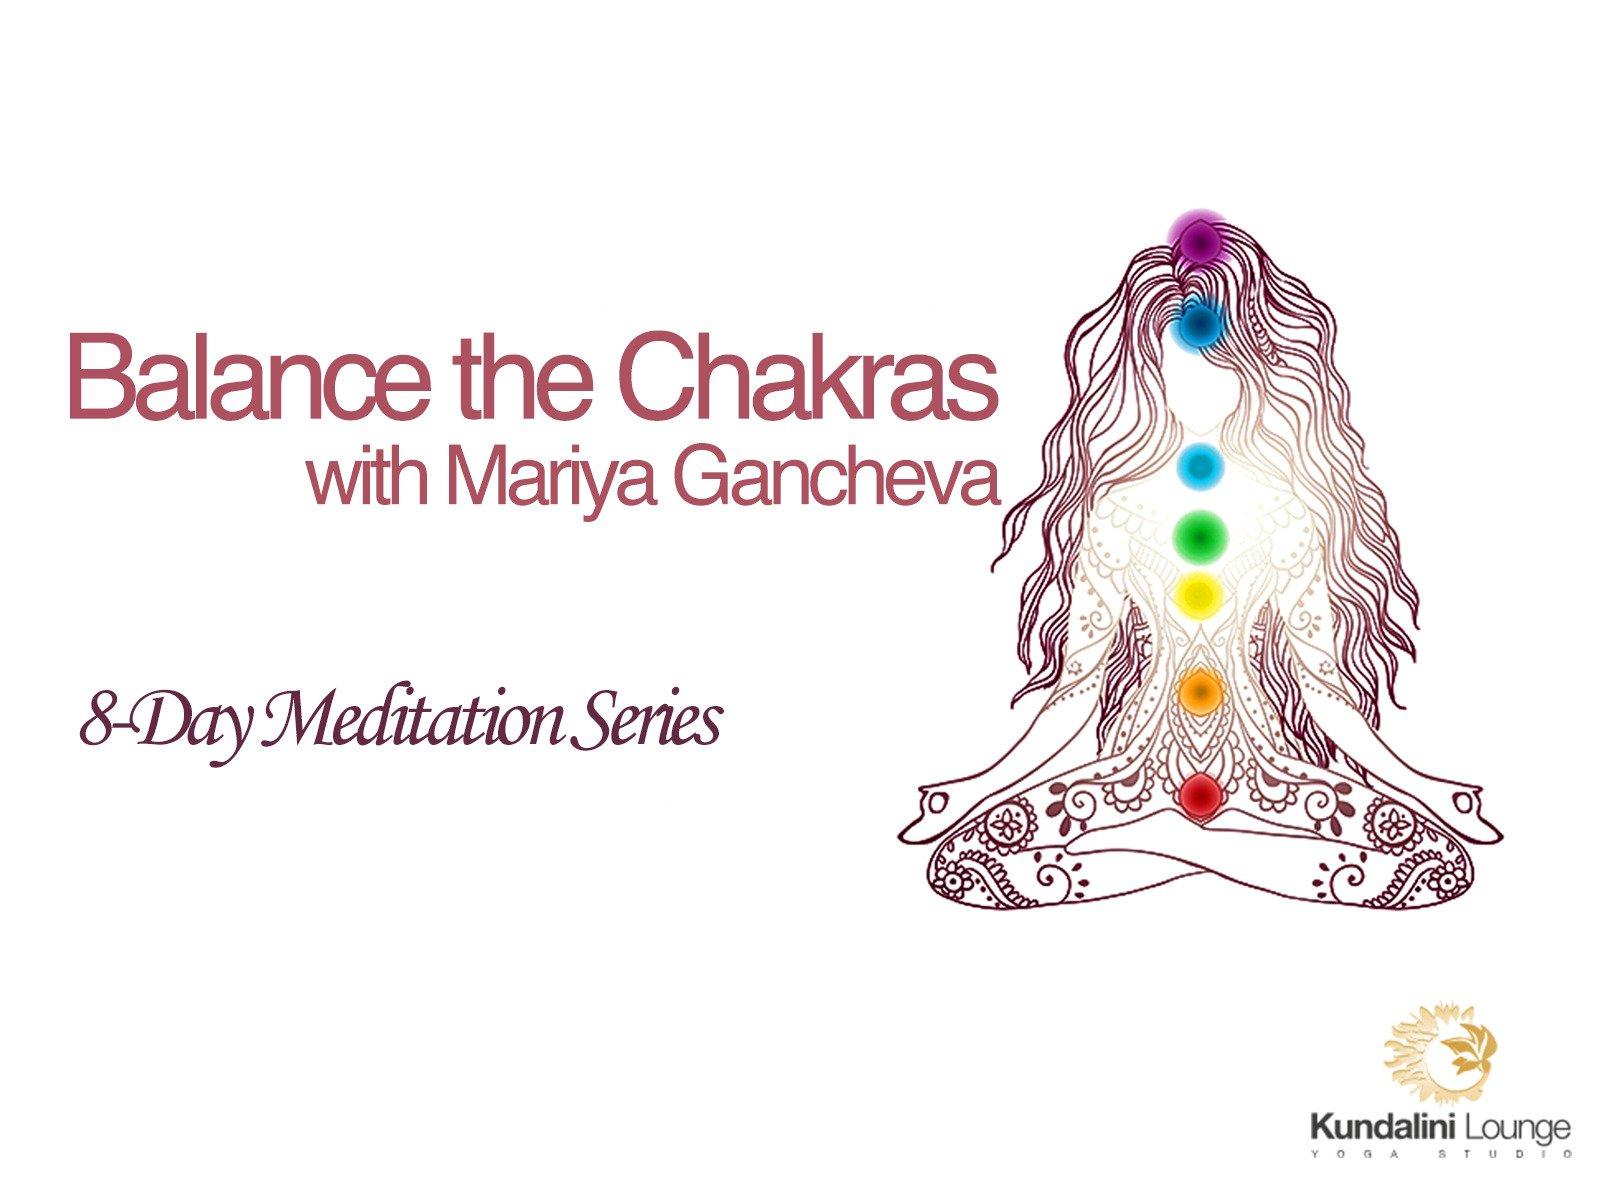 Balance the Chakras with Mariya Gancheva on Amazon Prime Video UK